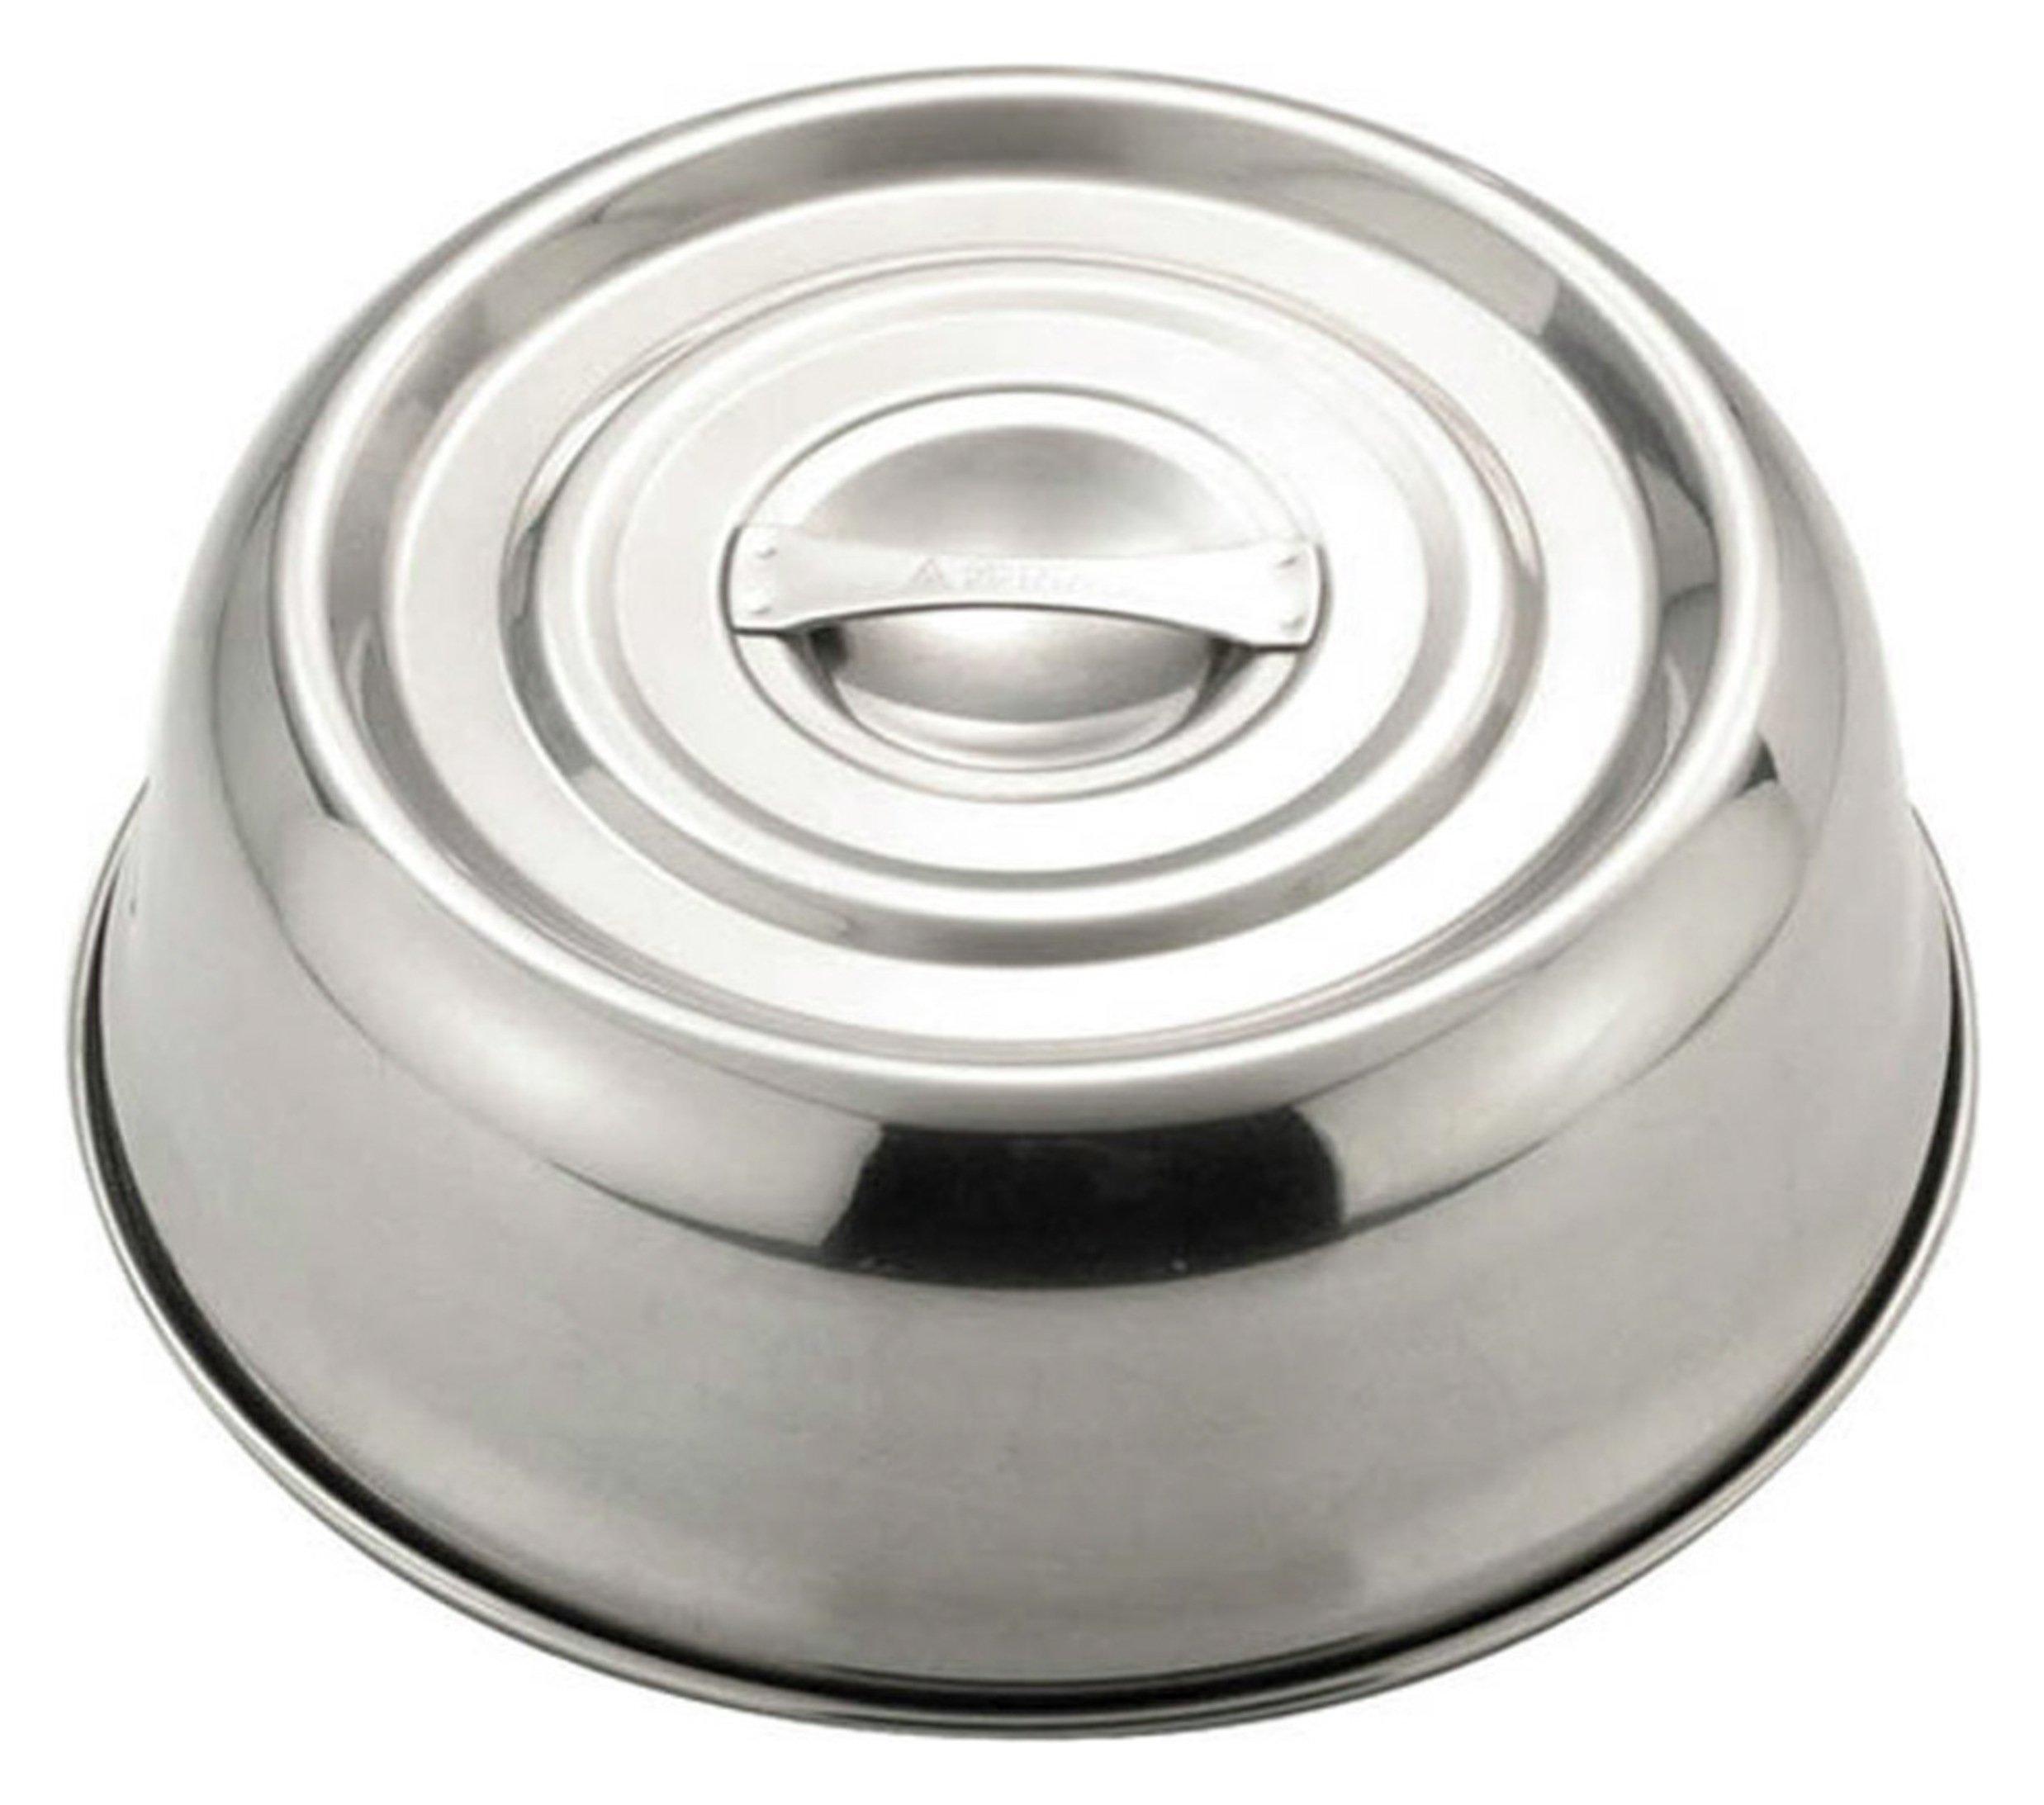 Zodiac 26.5cm Sunnex Plate Cover - Stainless Steel